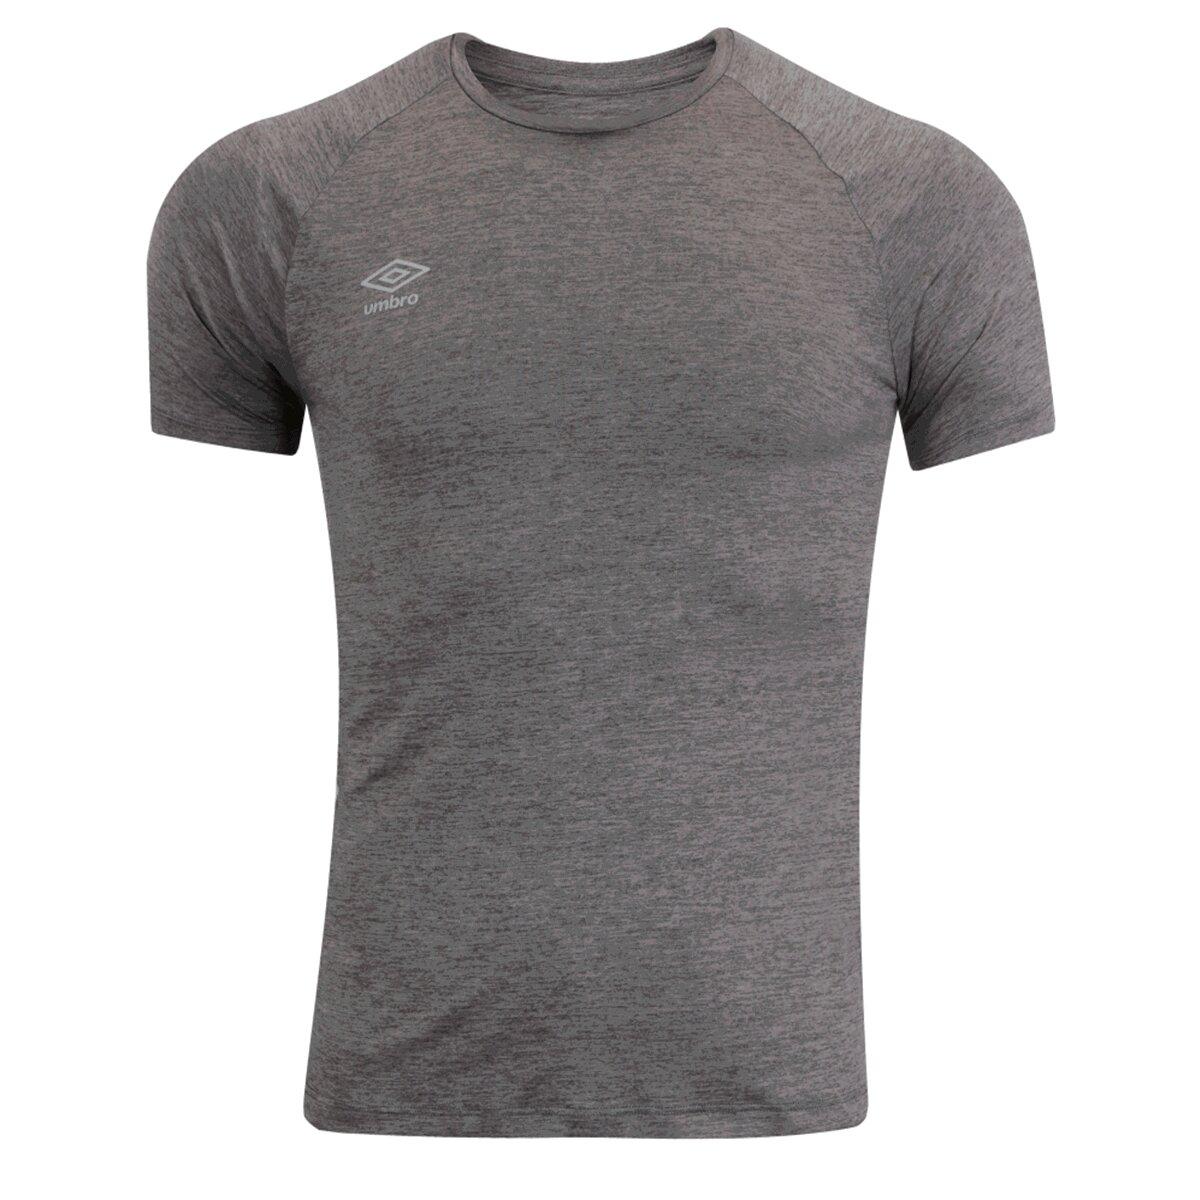 Camiseta Umbro TWR Flat New Masculino Cinza